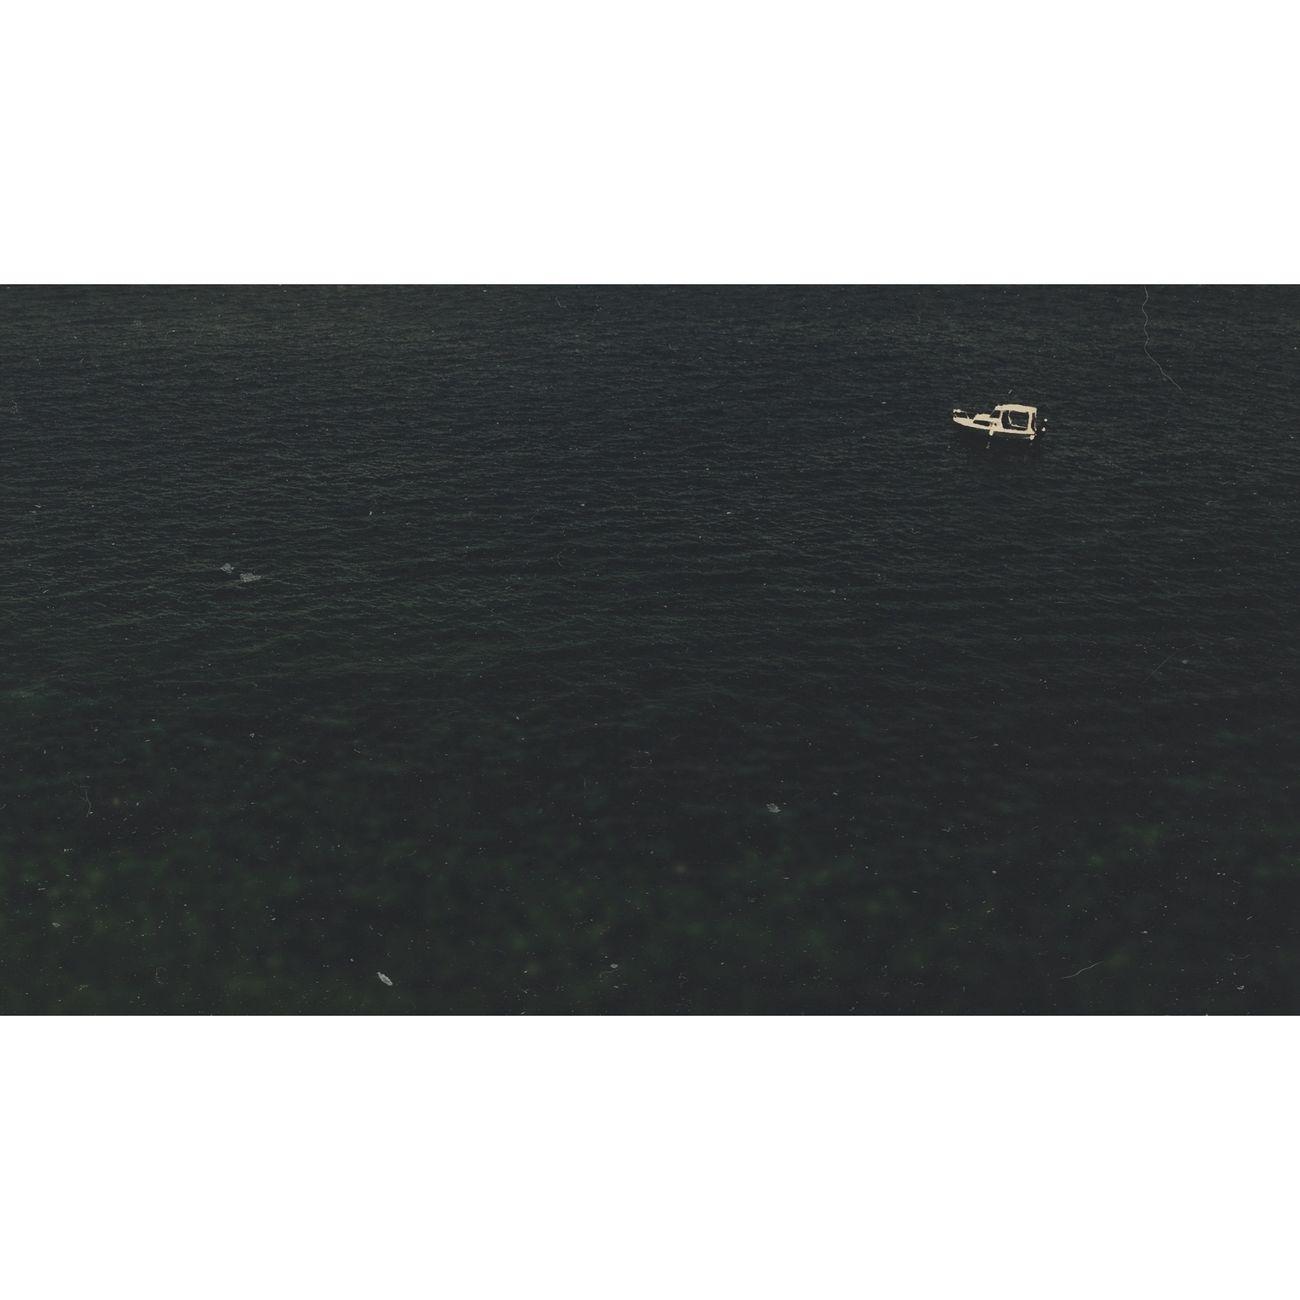 AMPt_community Nature Sea Nature_collection